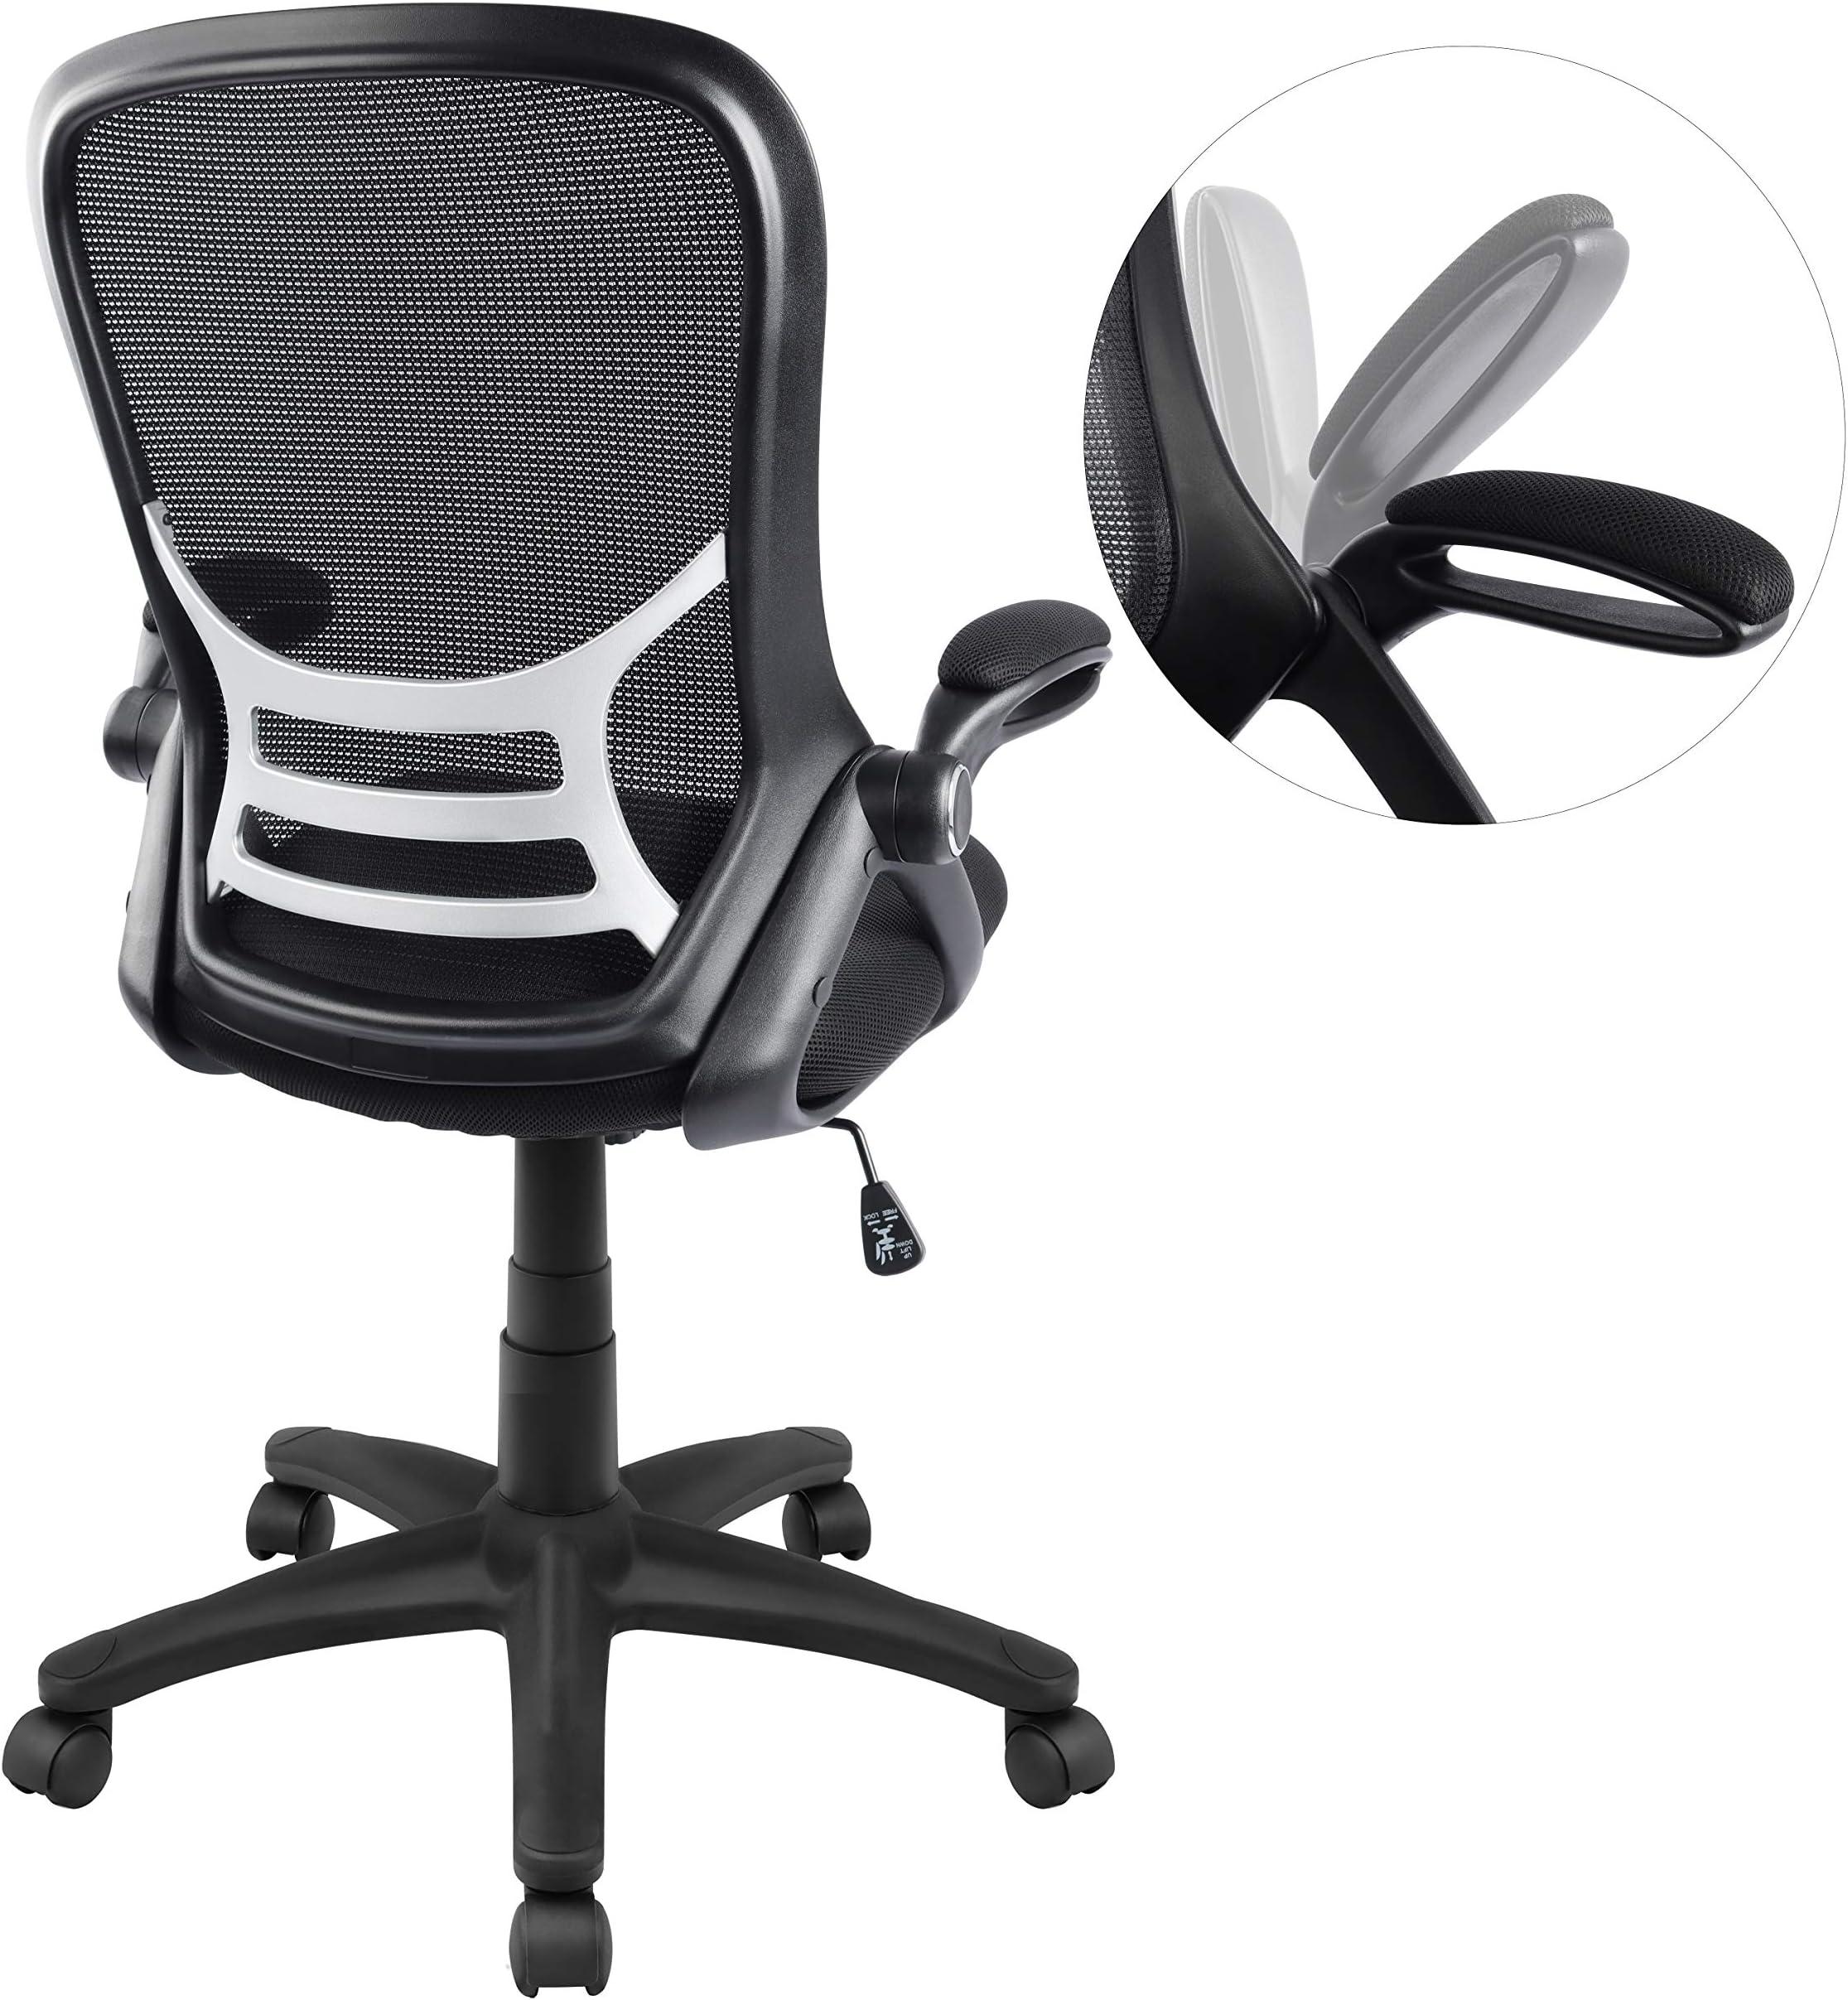 Funria ergonomic mesh office chair